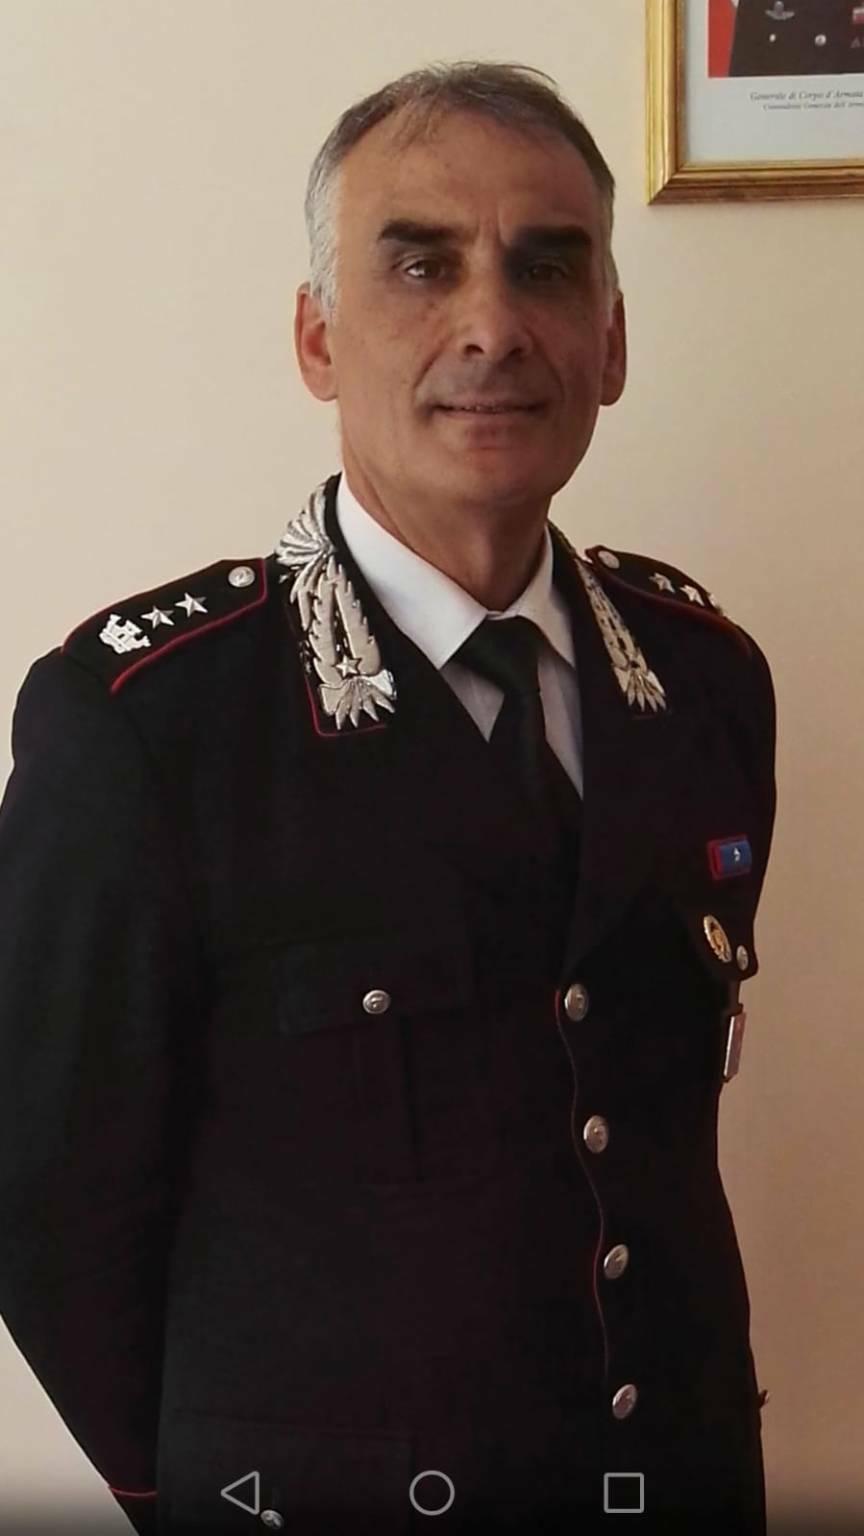 iacuzio carabinieri